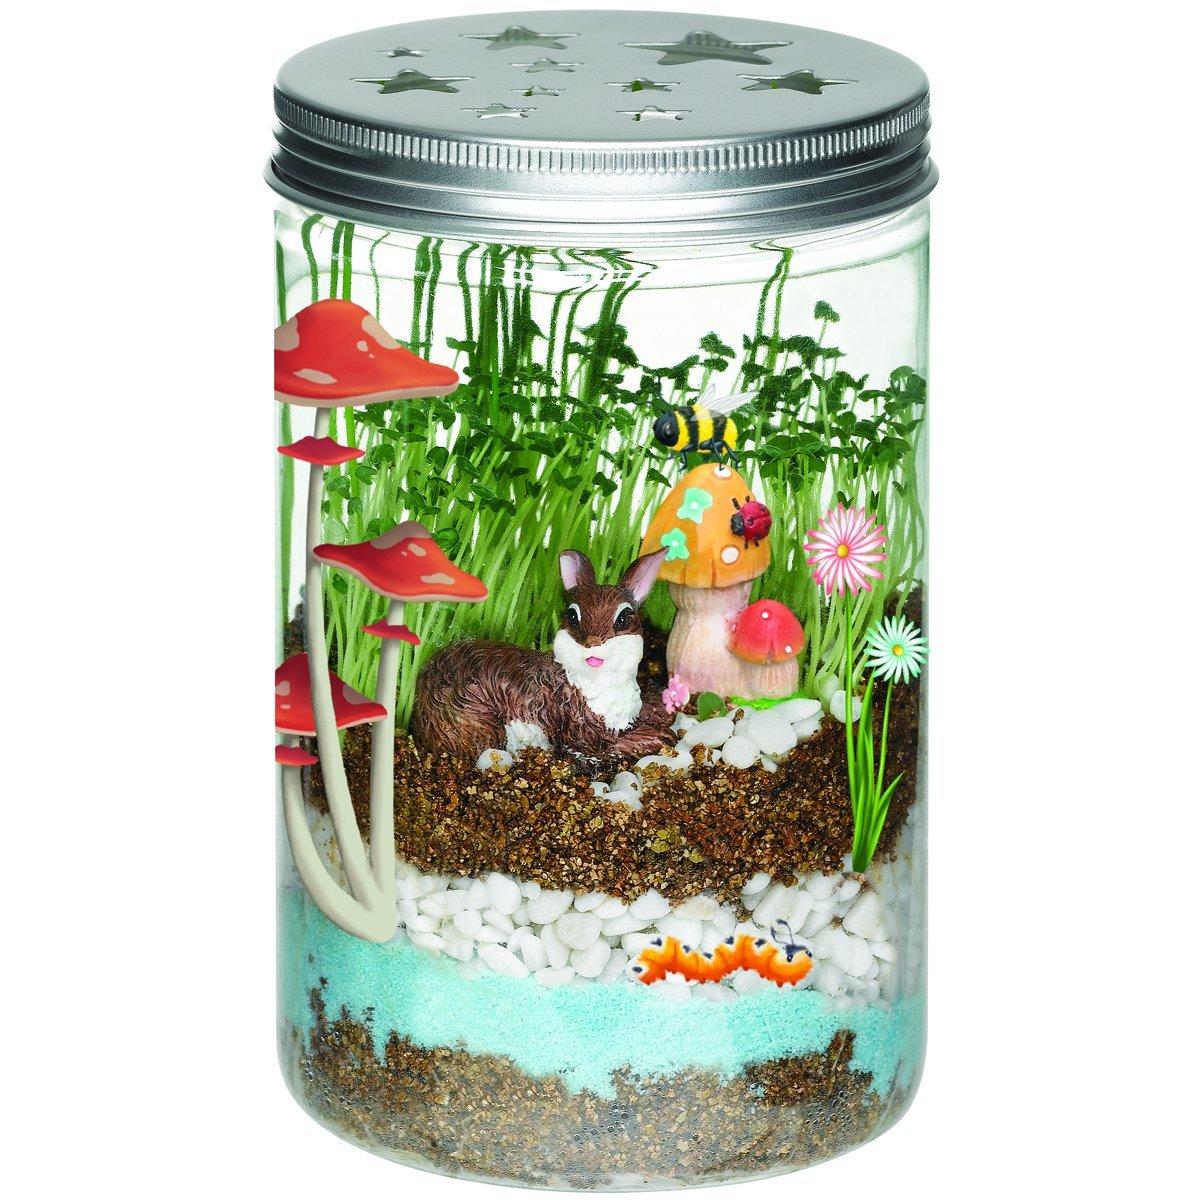 Creativity for kids grow  n glow terrarium 1